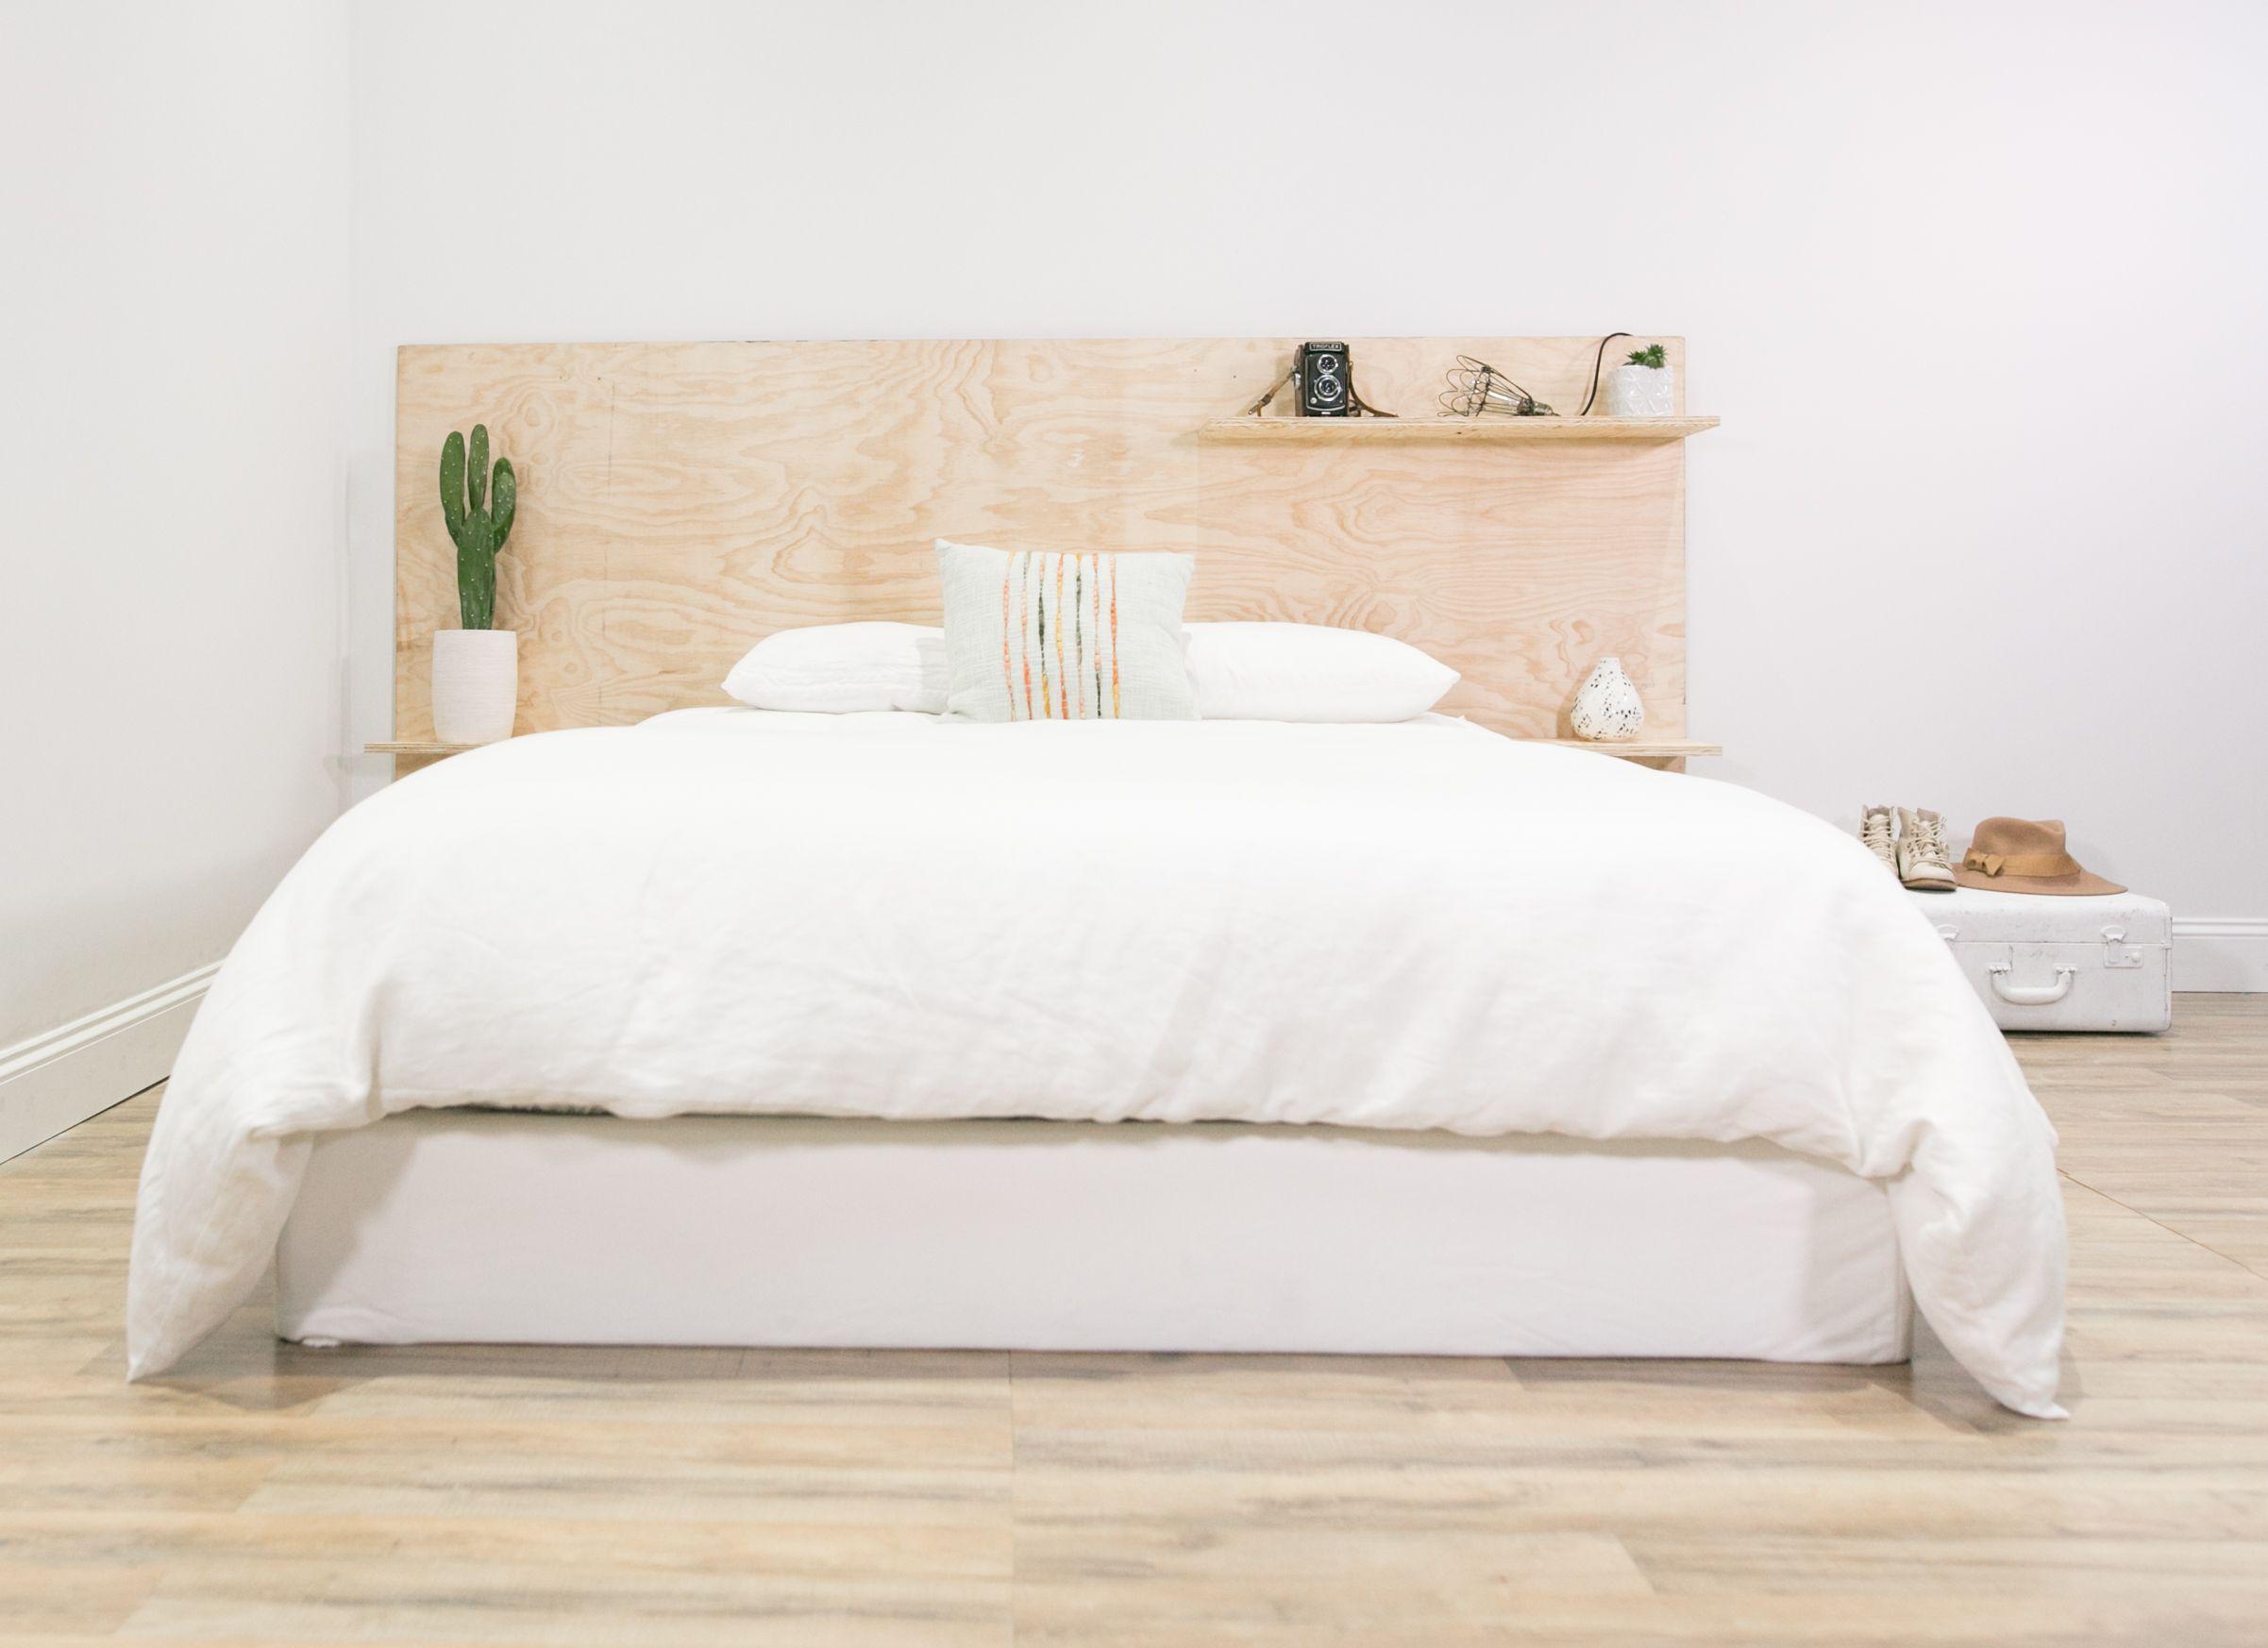 Diy Minimalist Plywood Shelf Headboard Small Bedroom Diy Diy